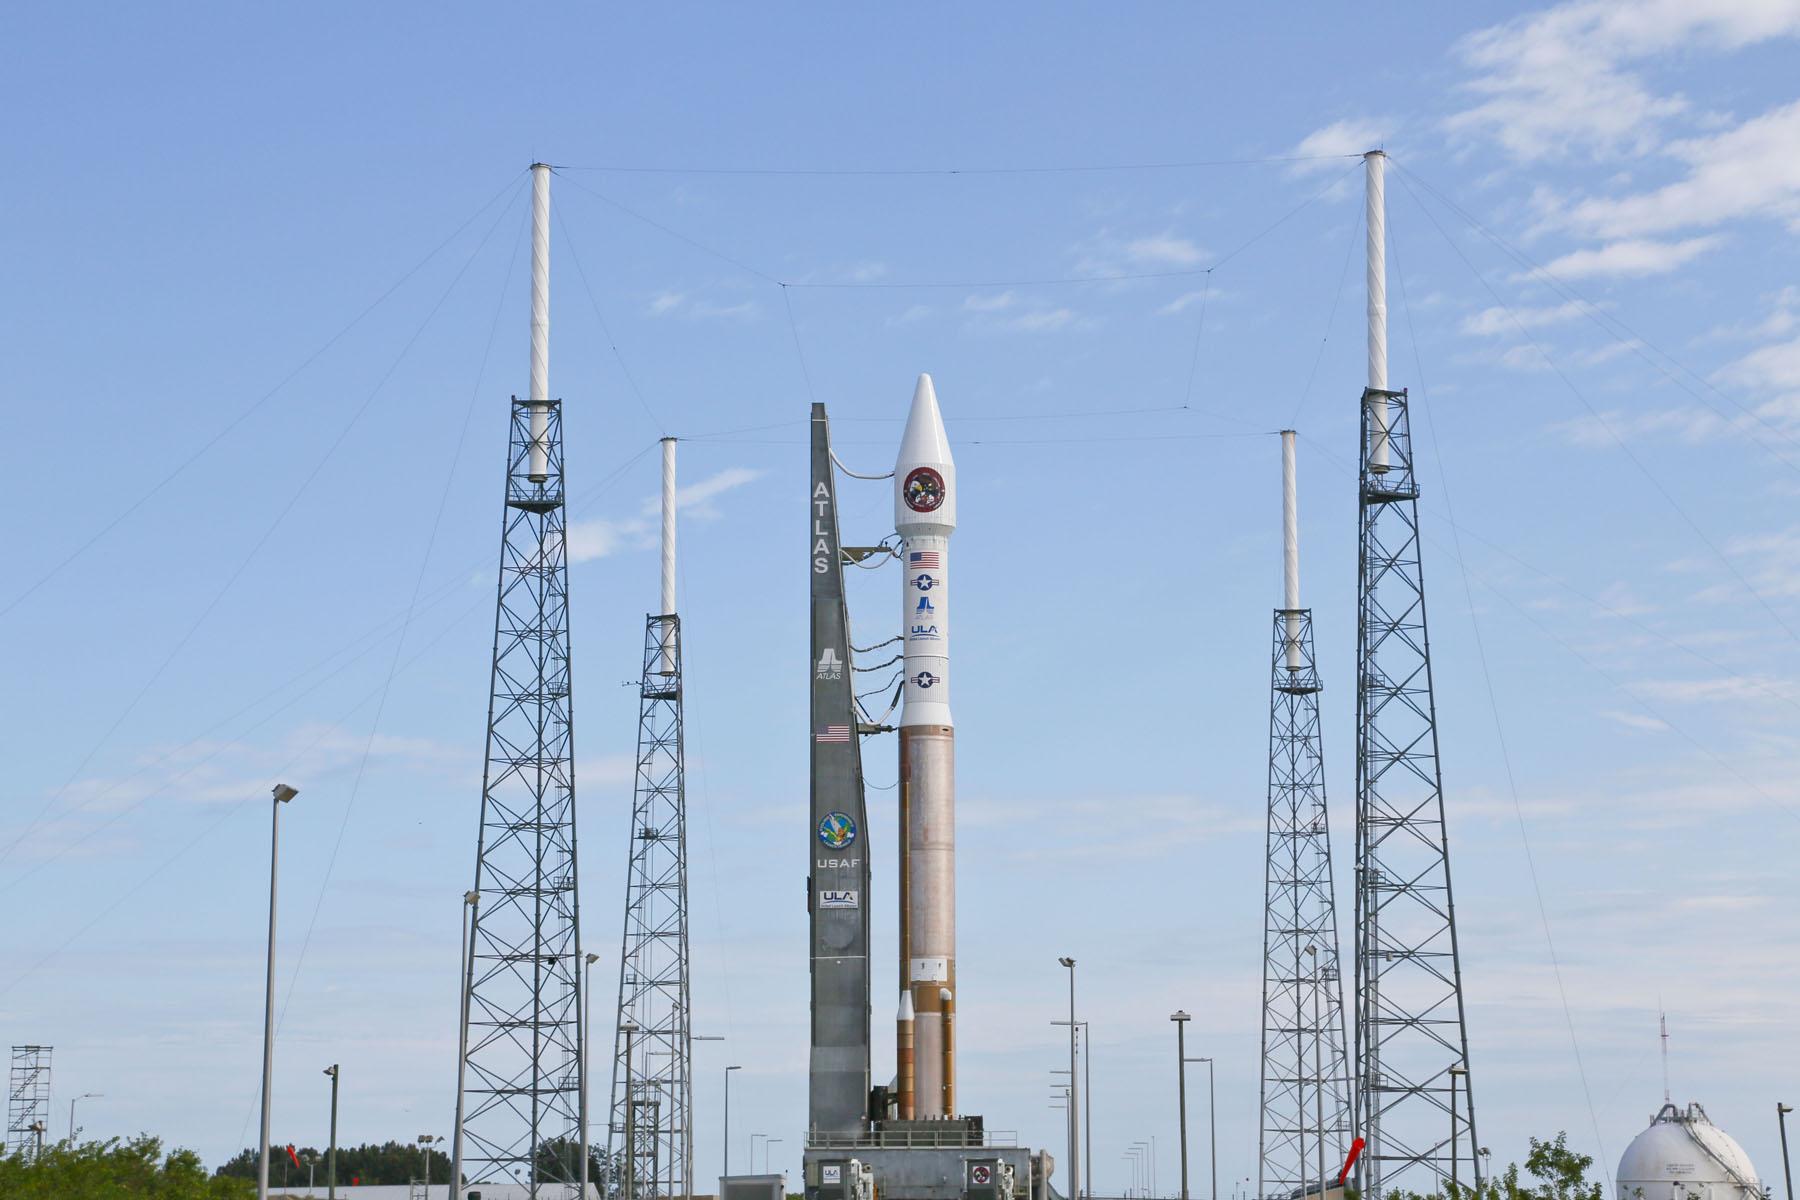 Atlas 5 Rocket Atop Launch Pad: SBIRS GEO-2